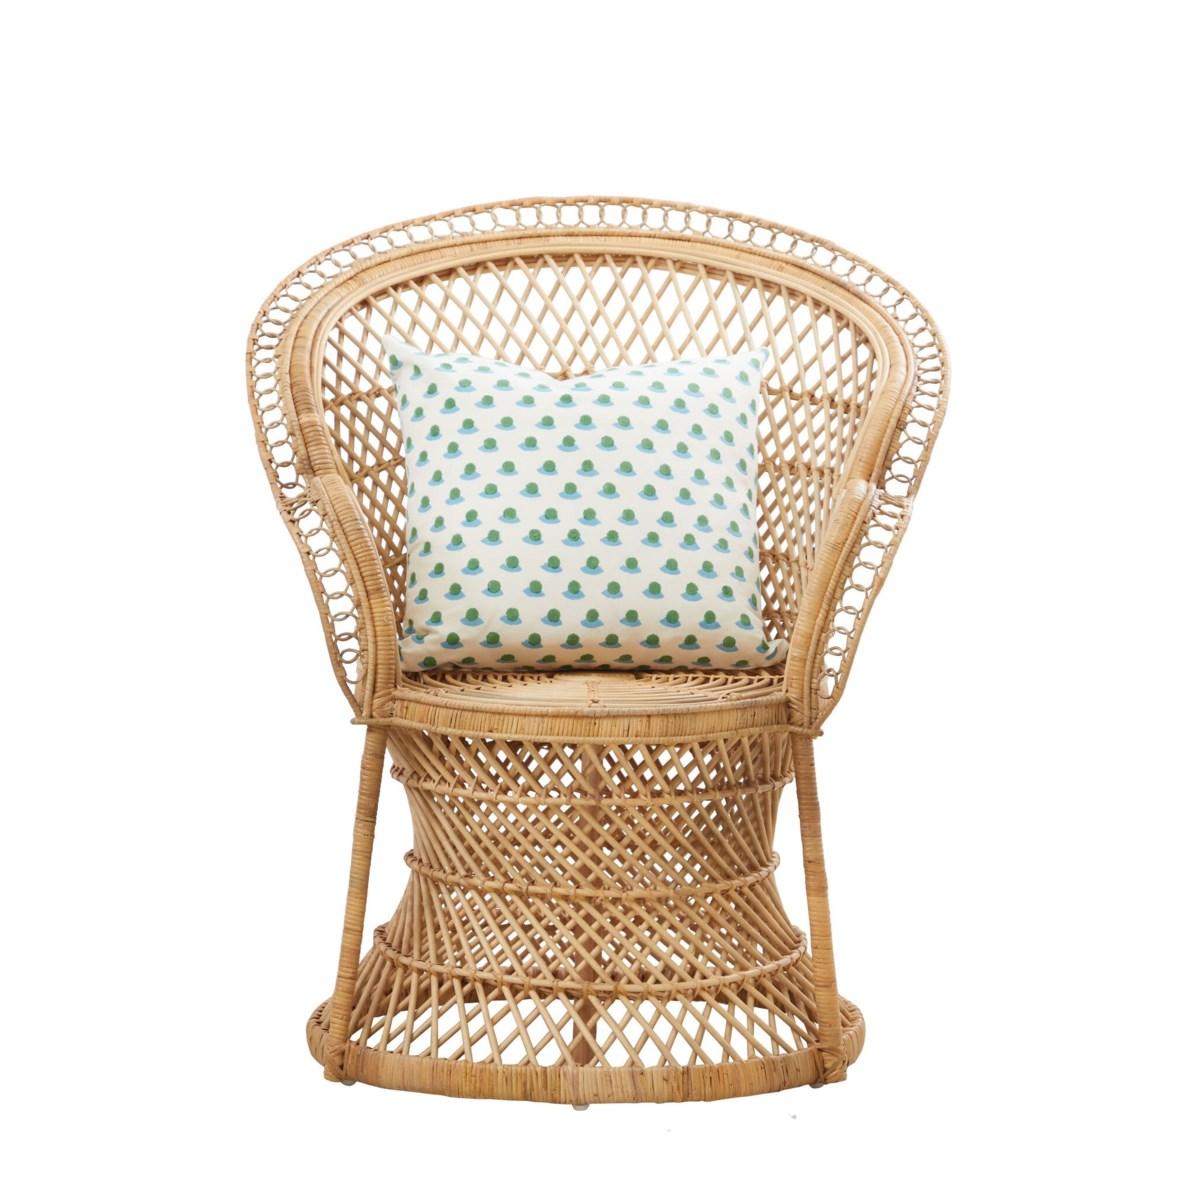 NEW!!  Bali Chair Color - Natural